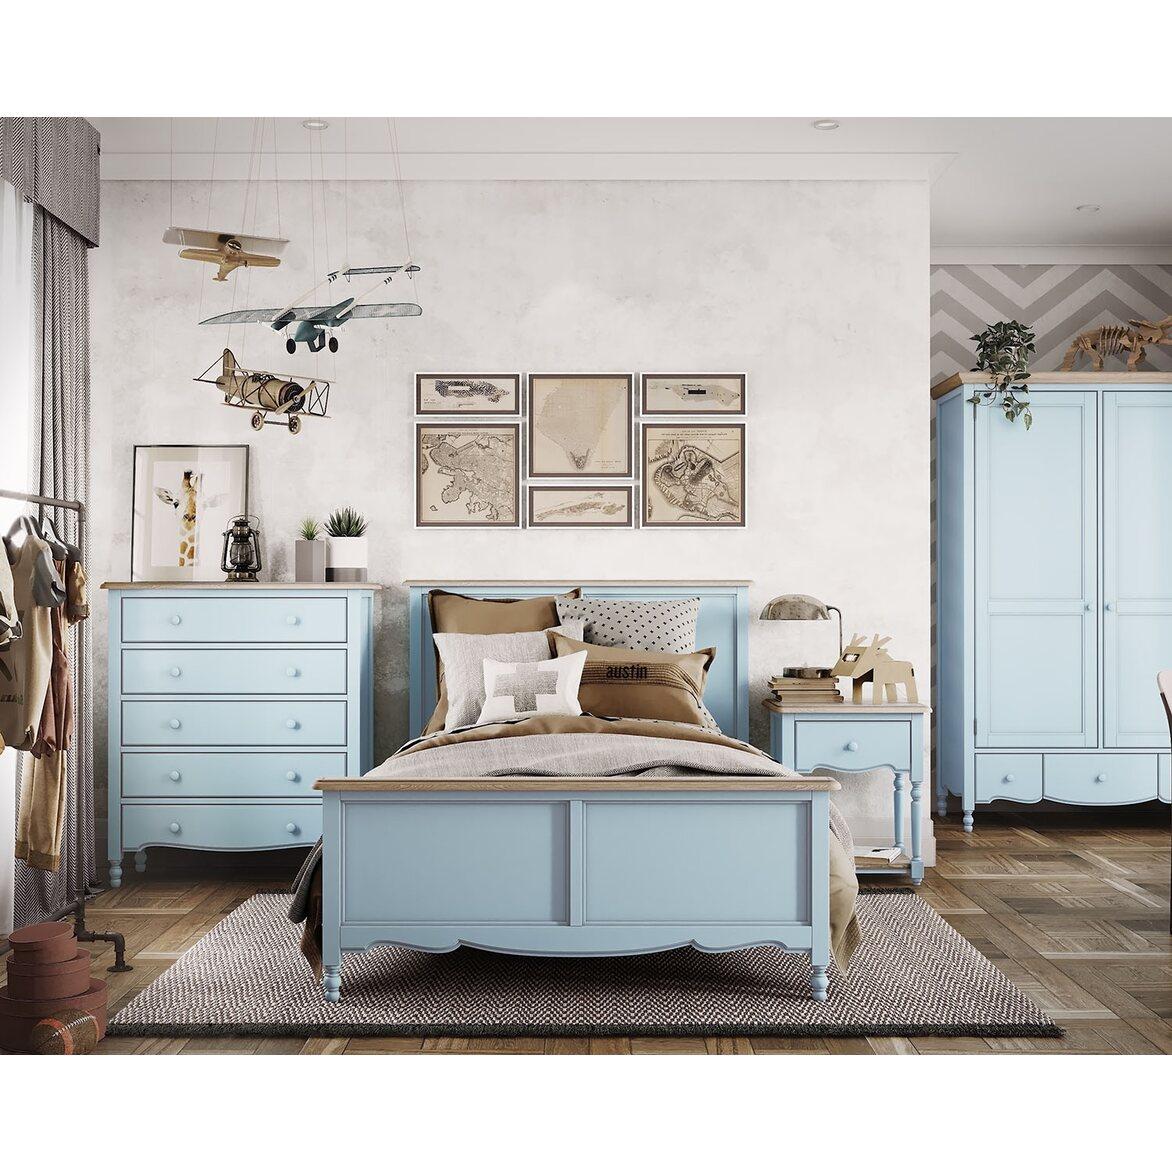 Шкаф двухстворчатый Leblanc, голубой 4 | Платяные шкафы Kingsby